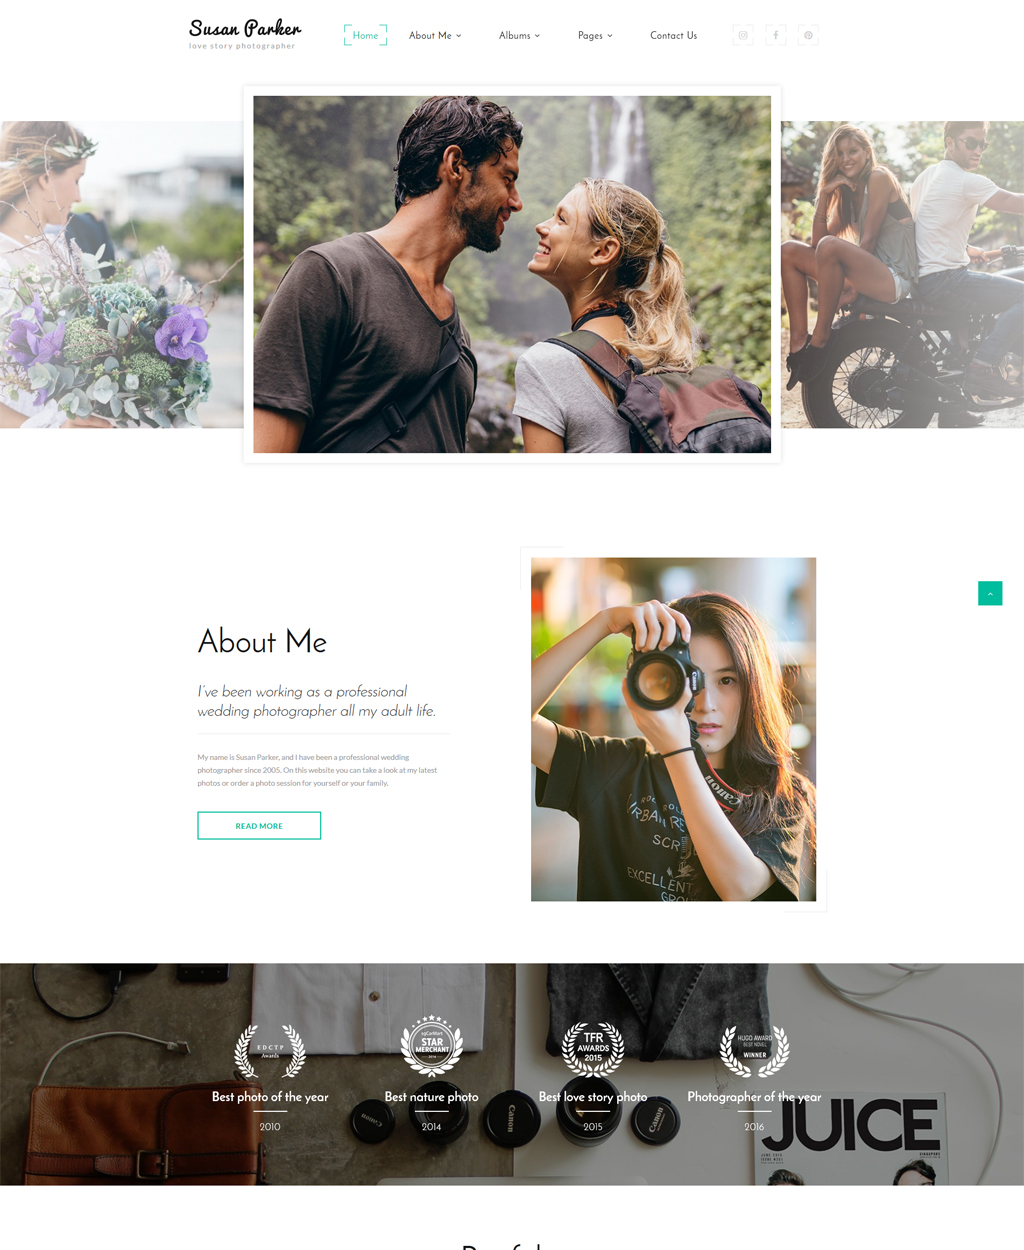 """Susan Parker - Lovestory Photographer Multipage"" modèle web adaptatif #64615"